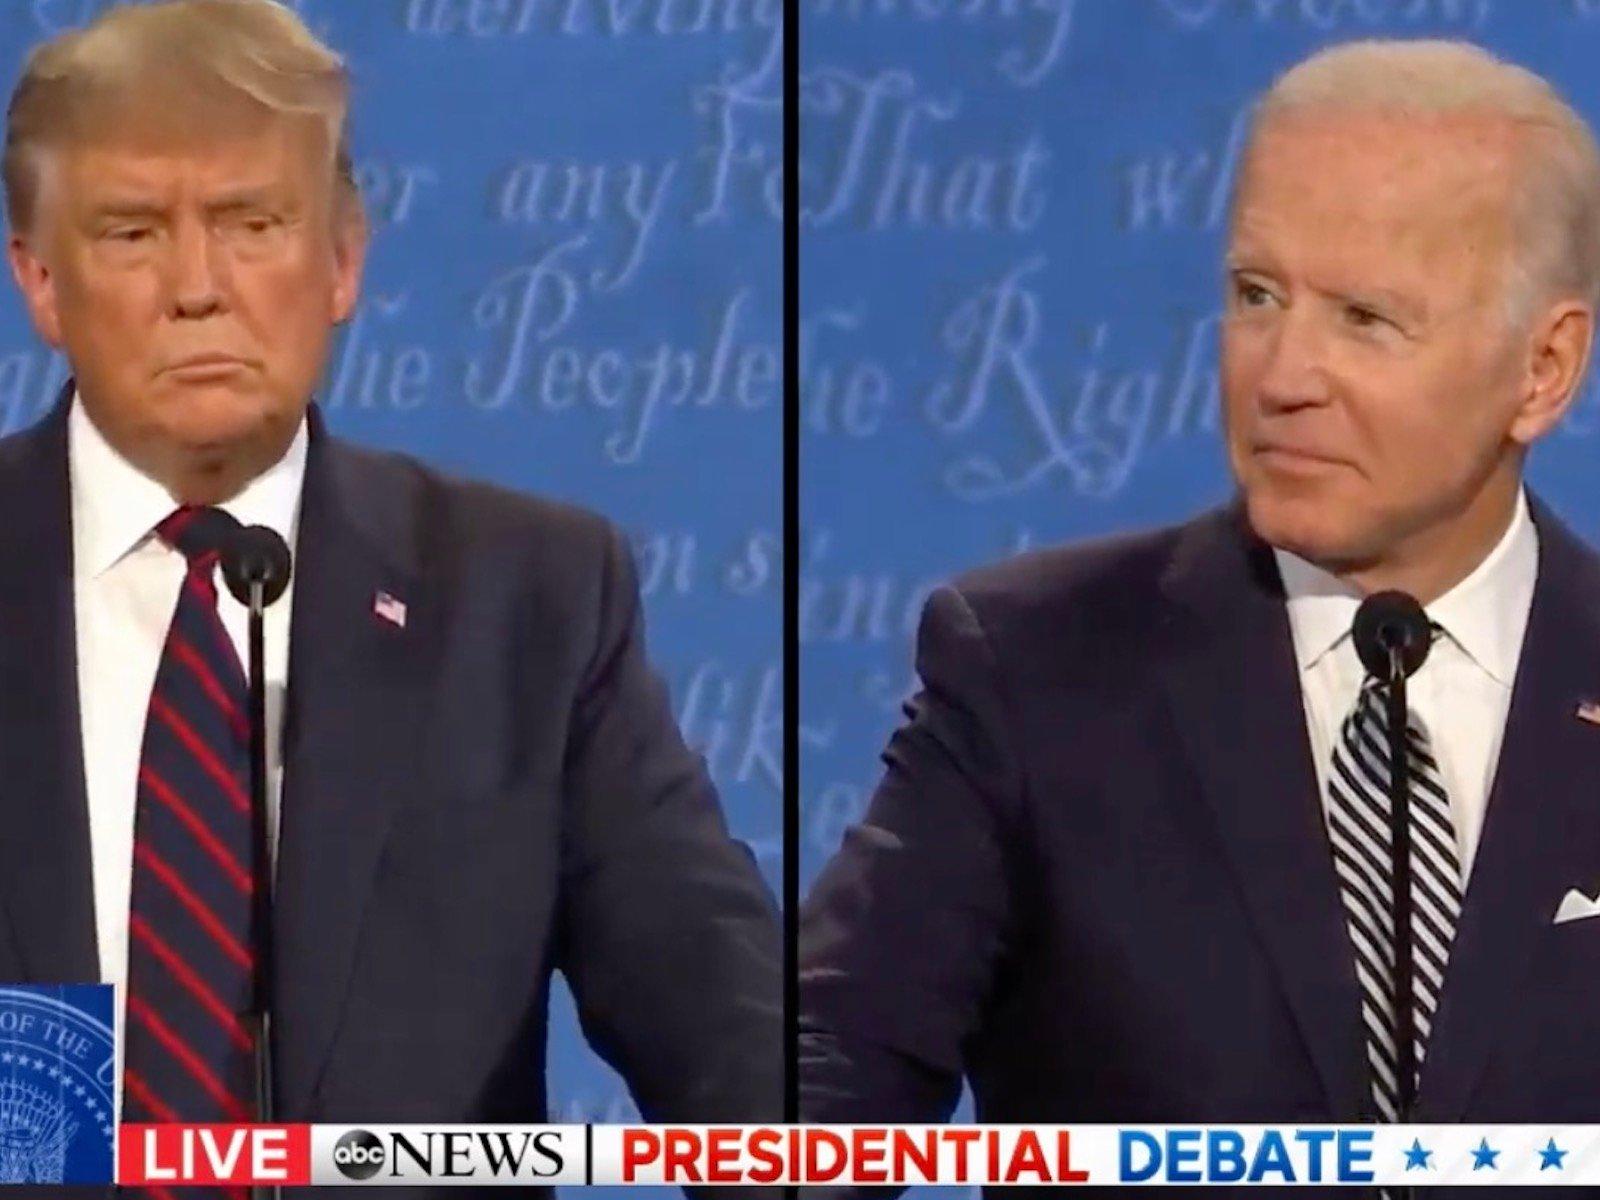 Joe Biden and Donald Trump Face-Off In First 2020 Presidential Debate [Live Stream]